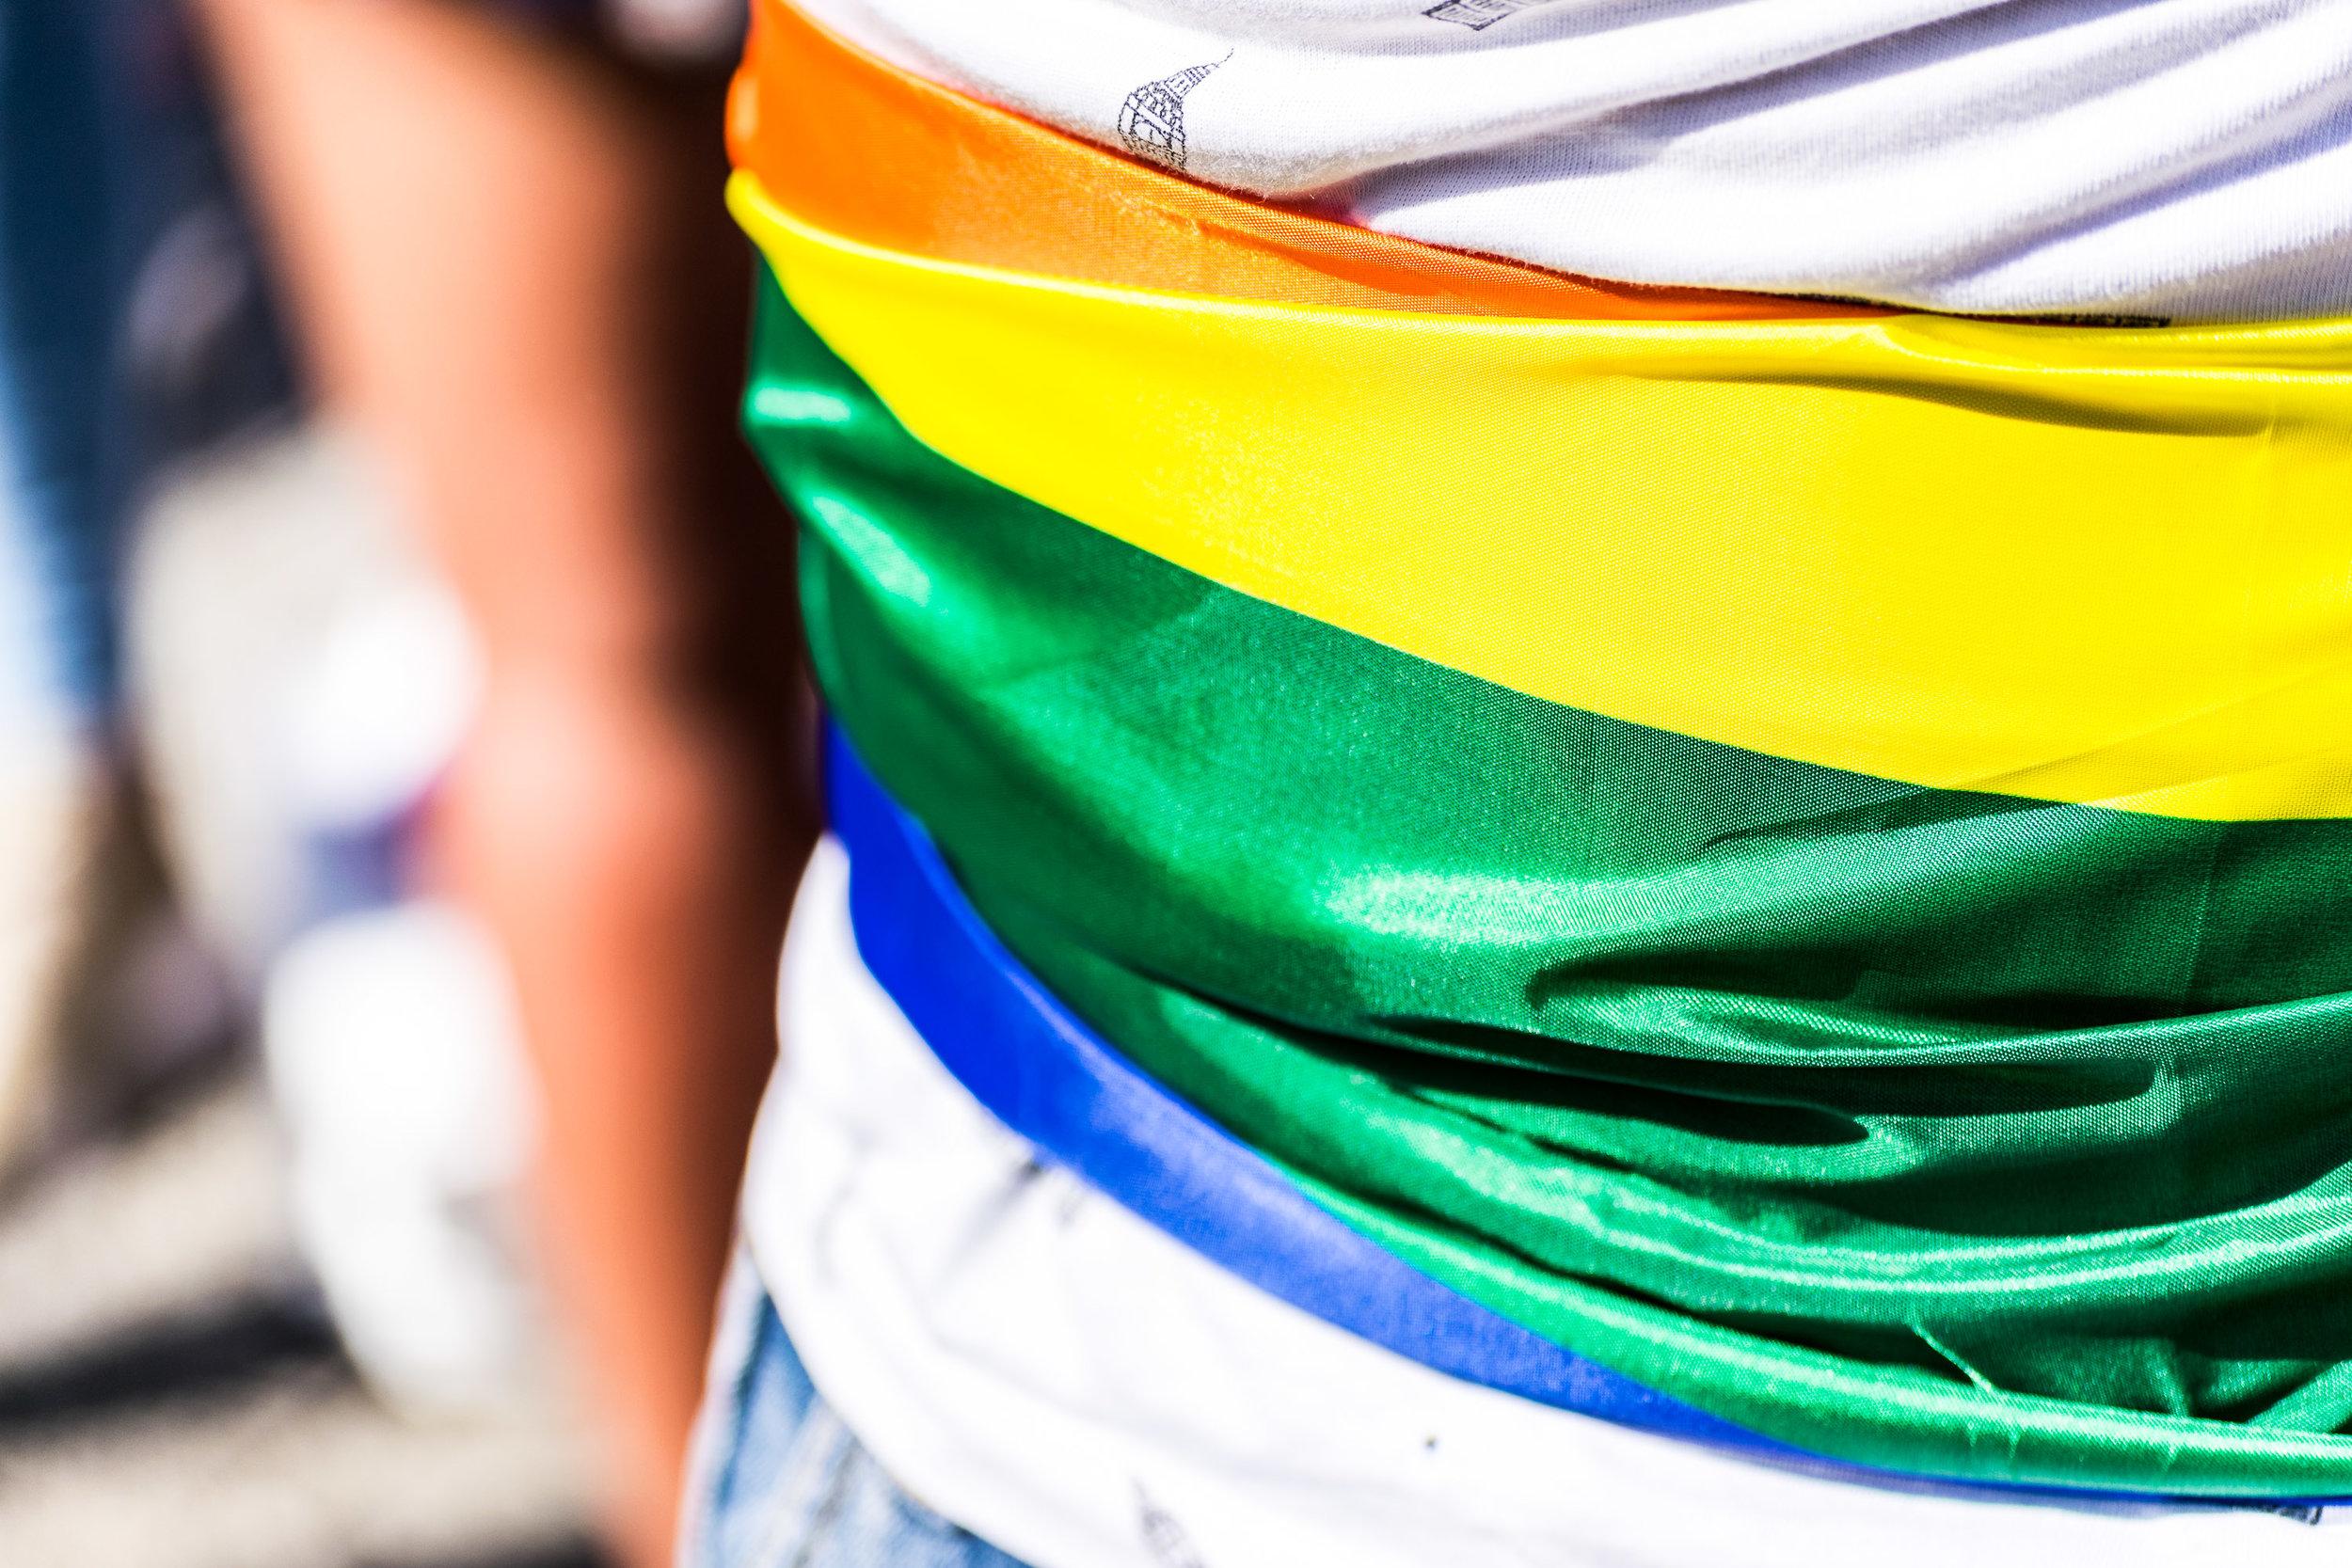 PrideLondon-08Jul2017-091.jpg